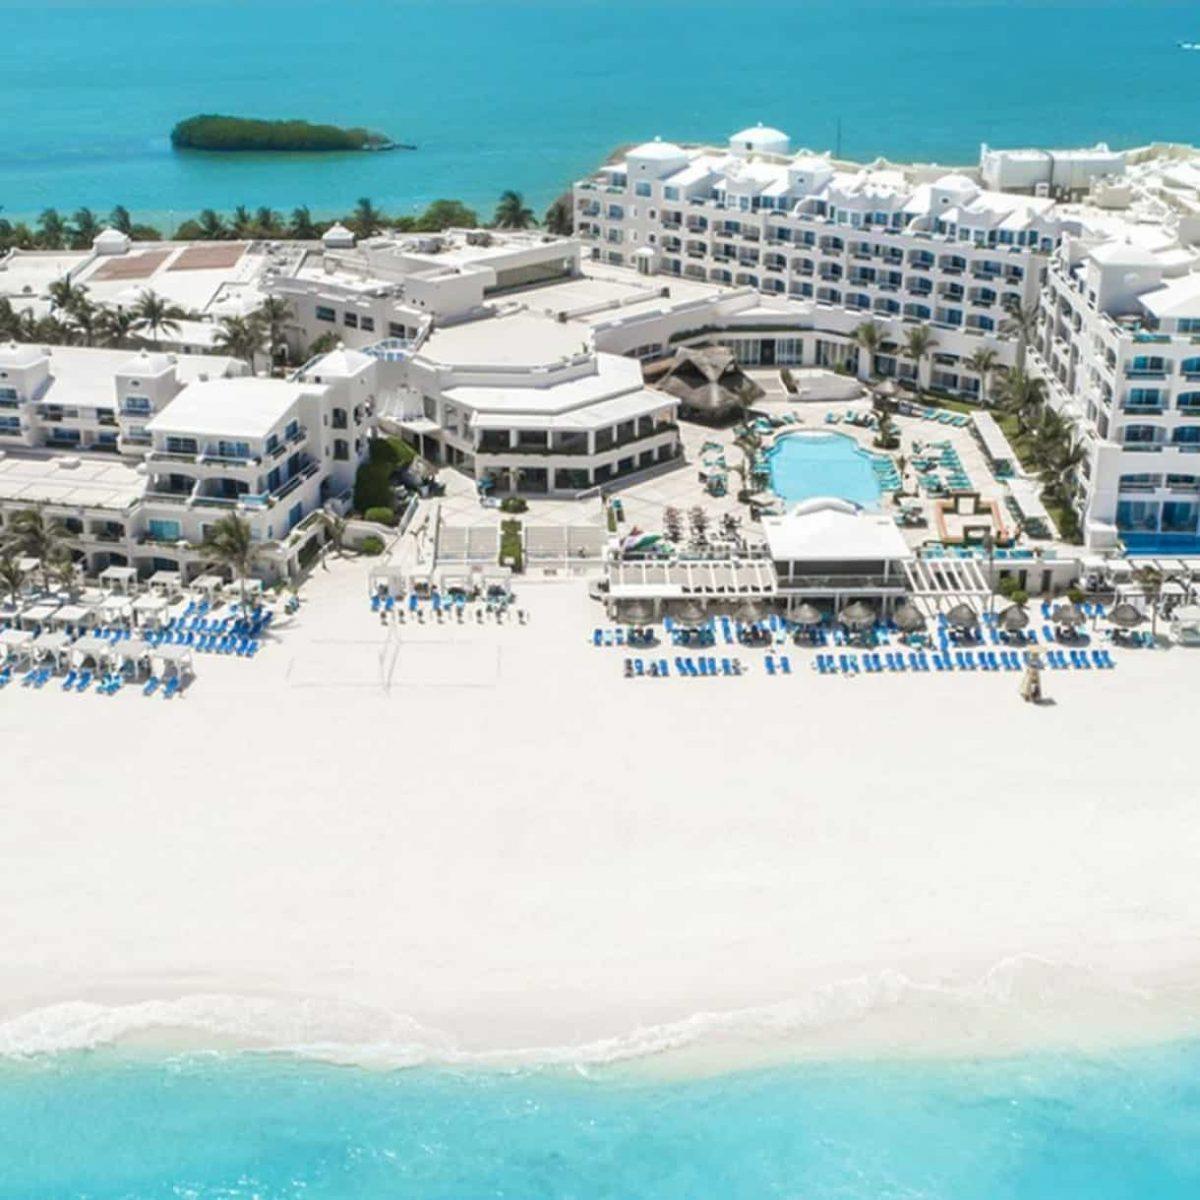 Oferta Riviera Maya: Hotel Panama Jack Resort Playa Del Carmen Desde $397.964 Cop